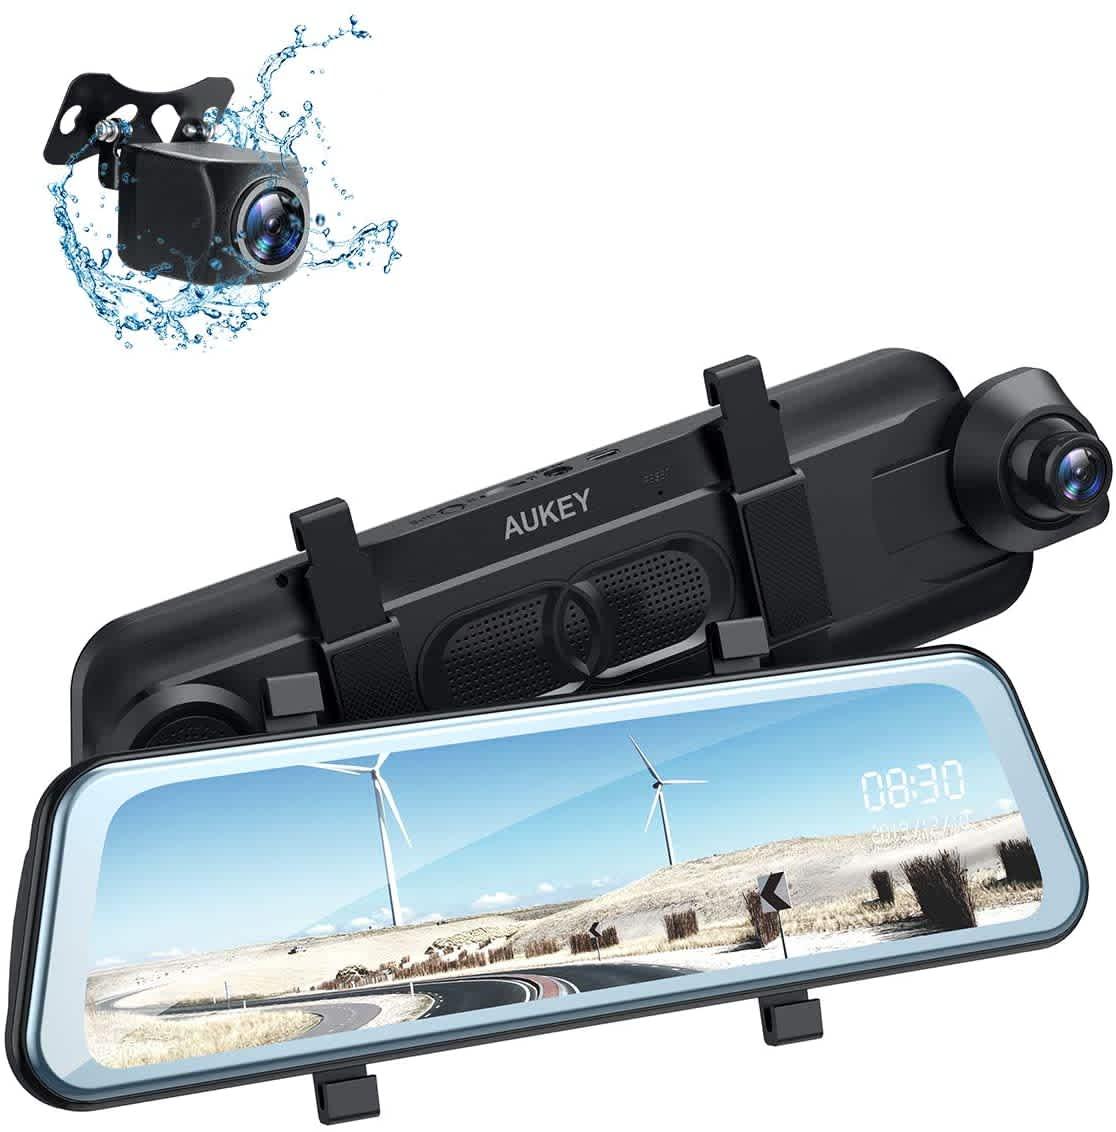 "Aukey 10"" 1080p Dual Front & Rear Backup Camera"